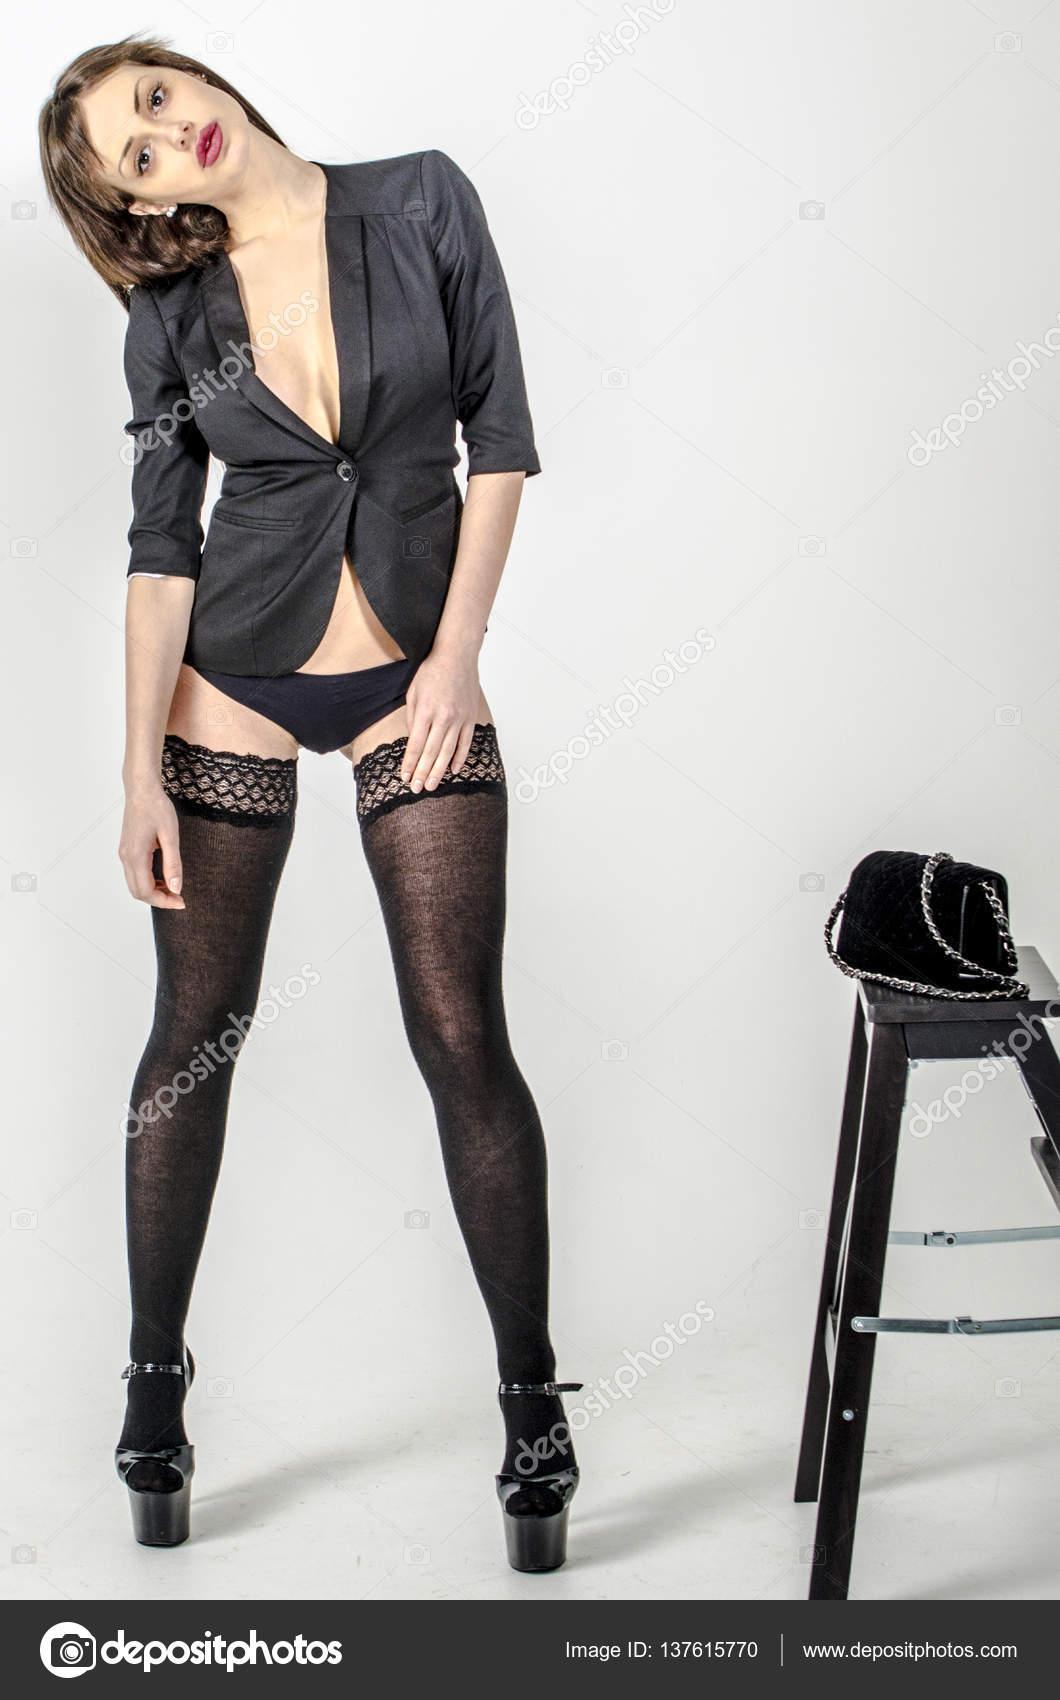 Онлайн сексу девушка фото чулках платя девушек вебке порно